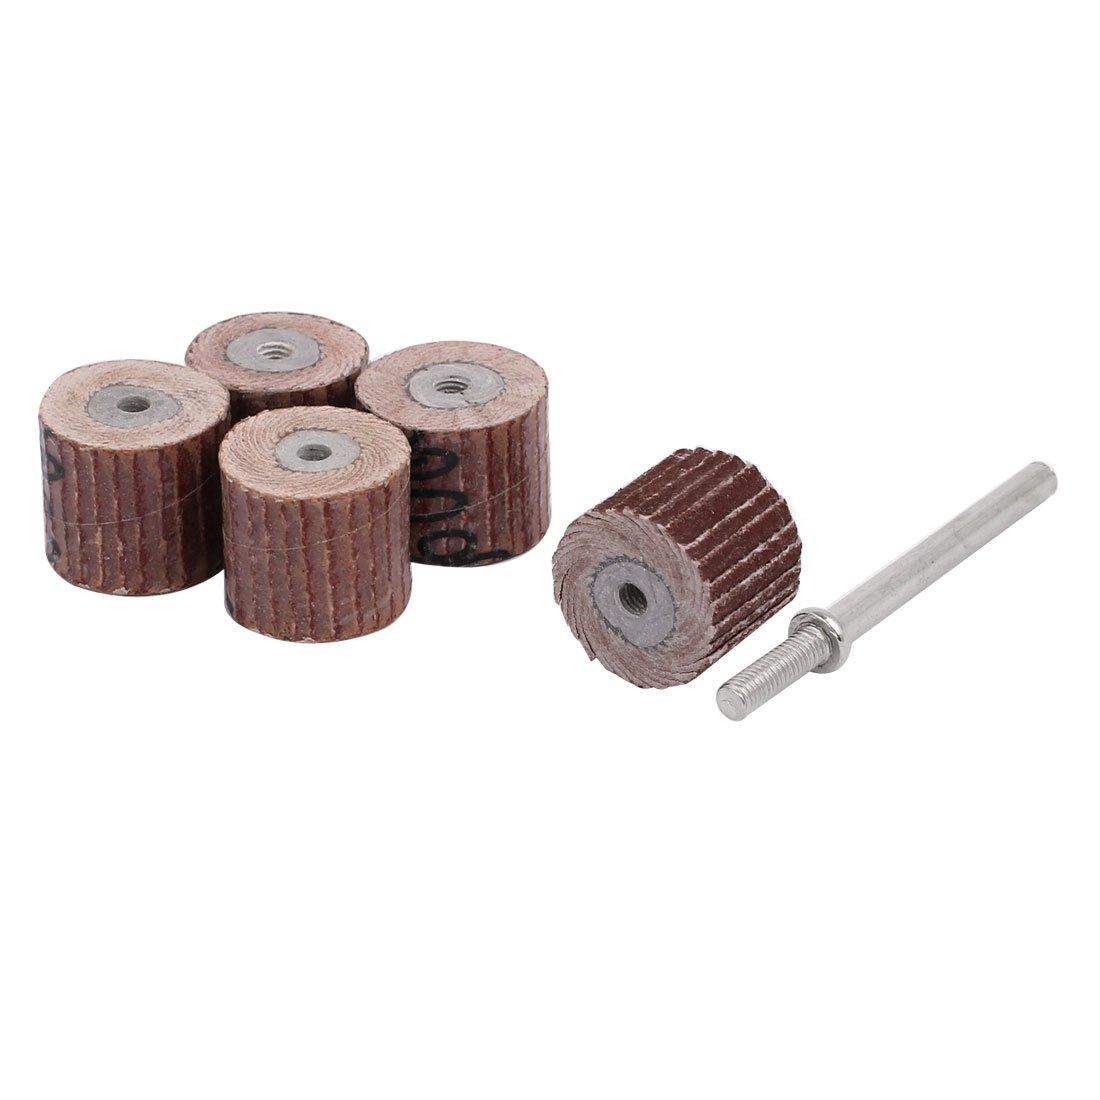 uxcell 600 Grit 13mm Dia Sandpaper Flap Sanding Wheel Grinding Polishing Tool 5pcs